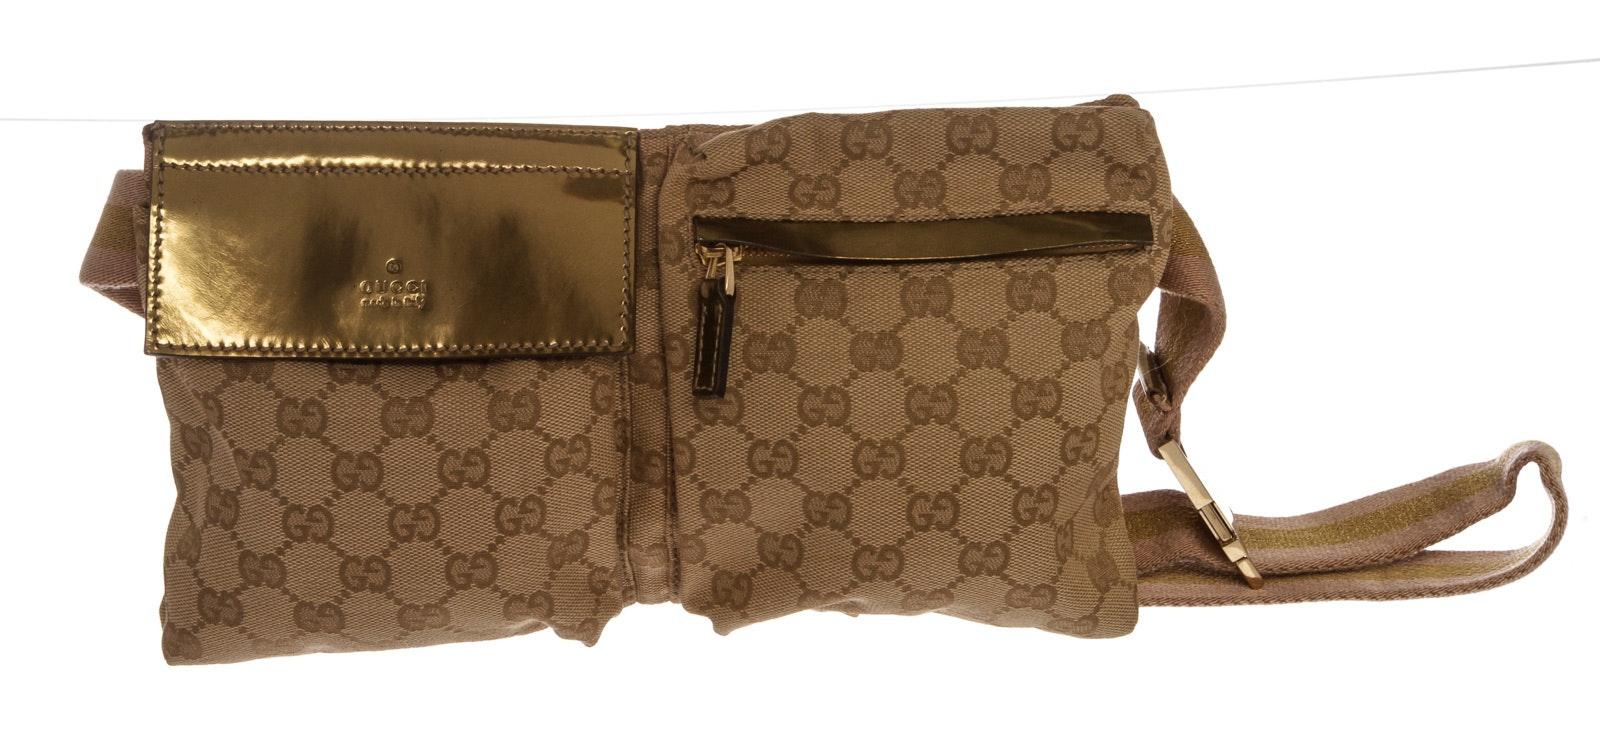 Gucci Flap Waist Bag GG Monogram Beige/Gold